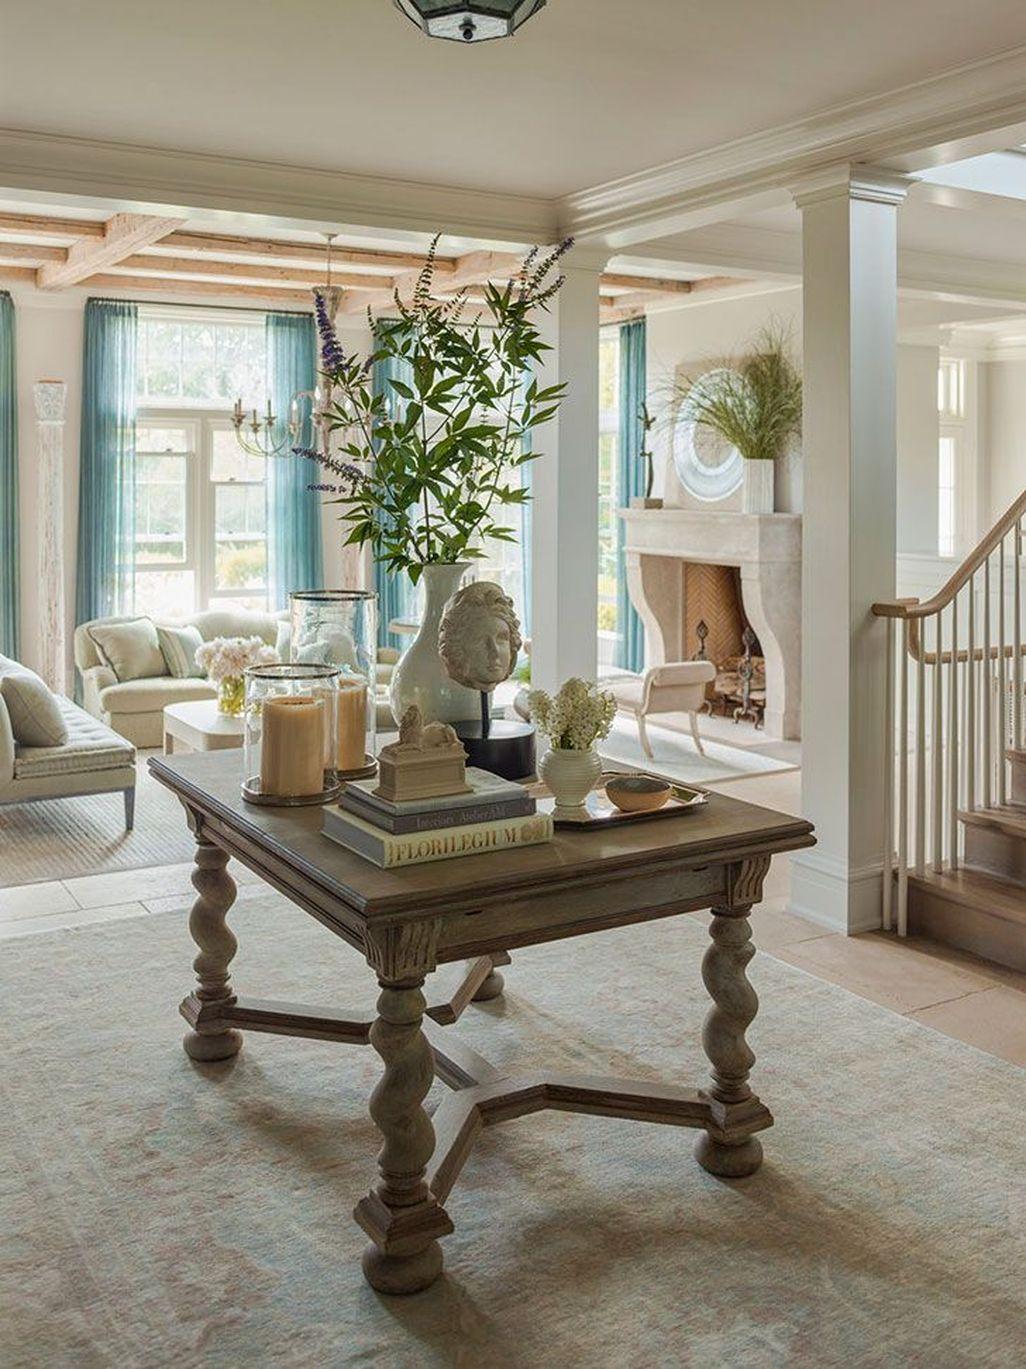 49 elegant interior european style ideas that will make your home rh pinterest com